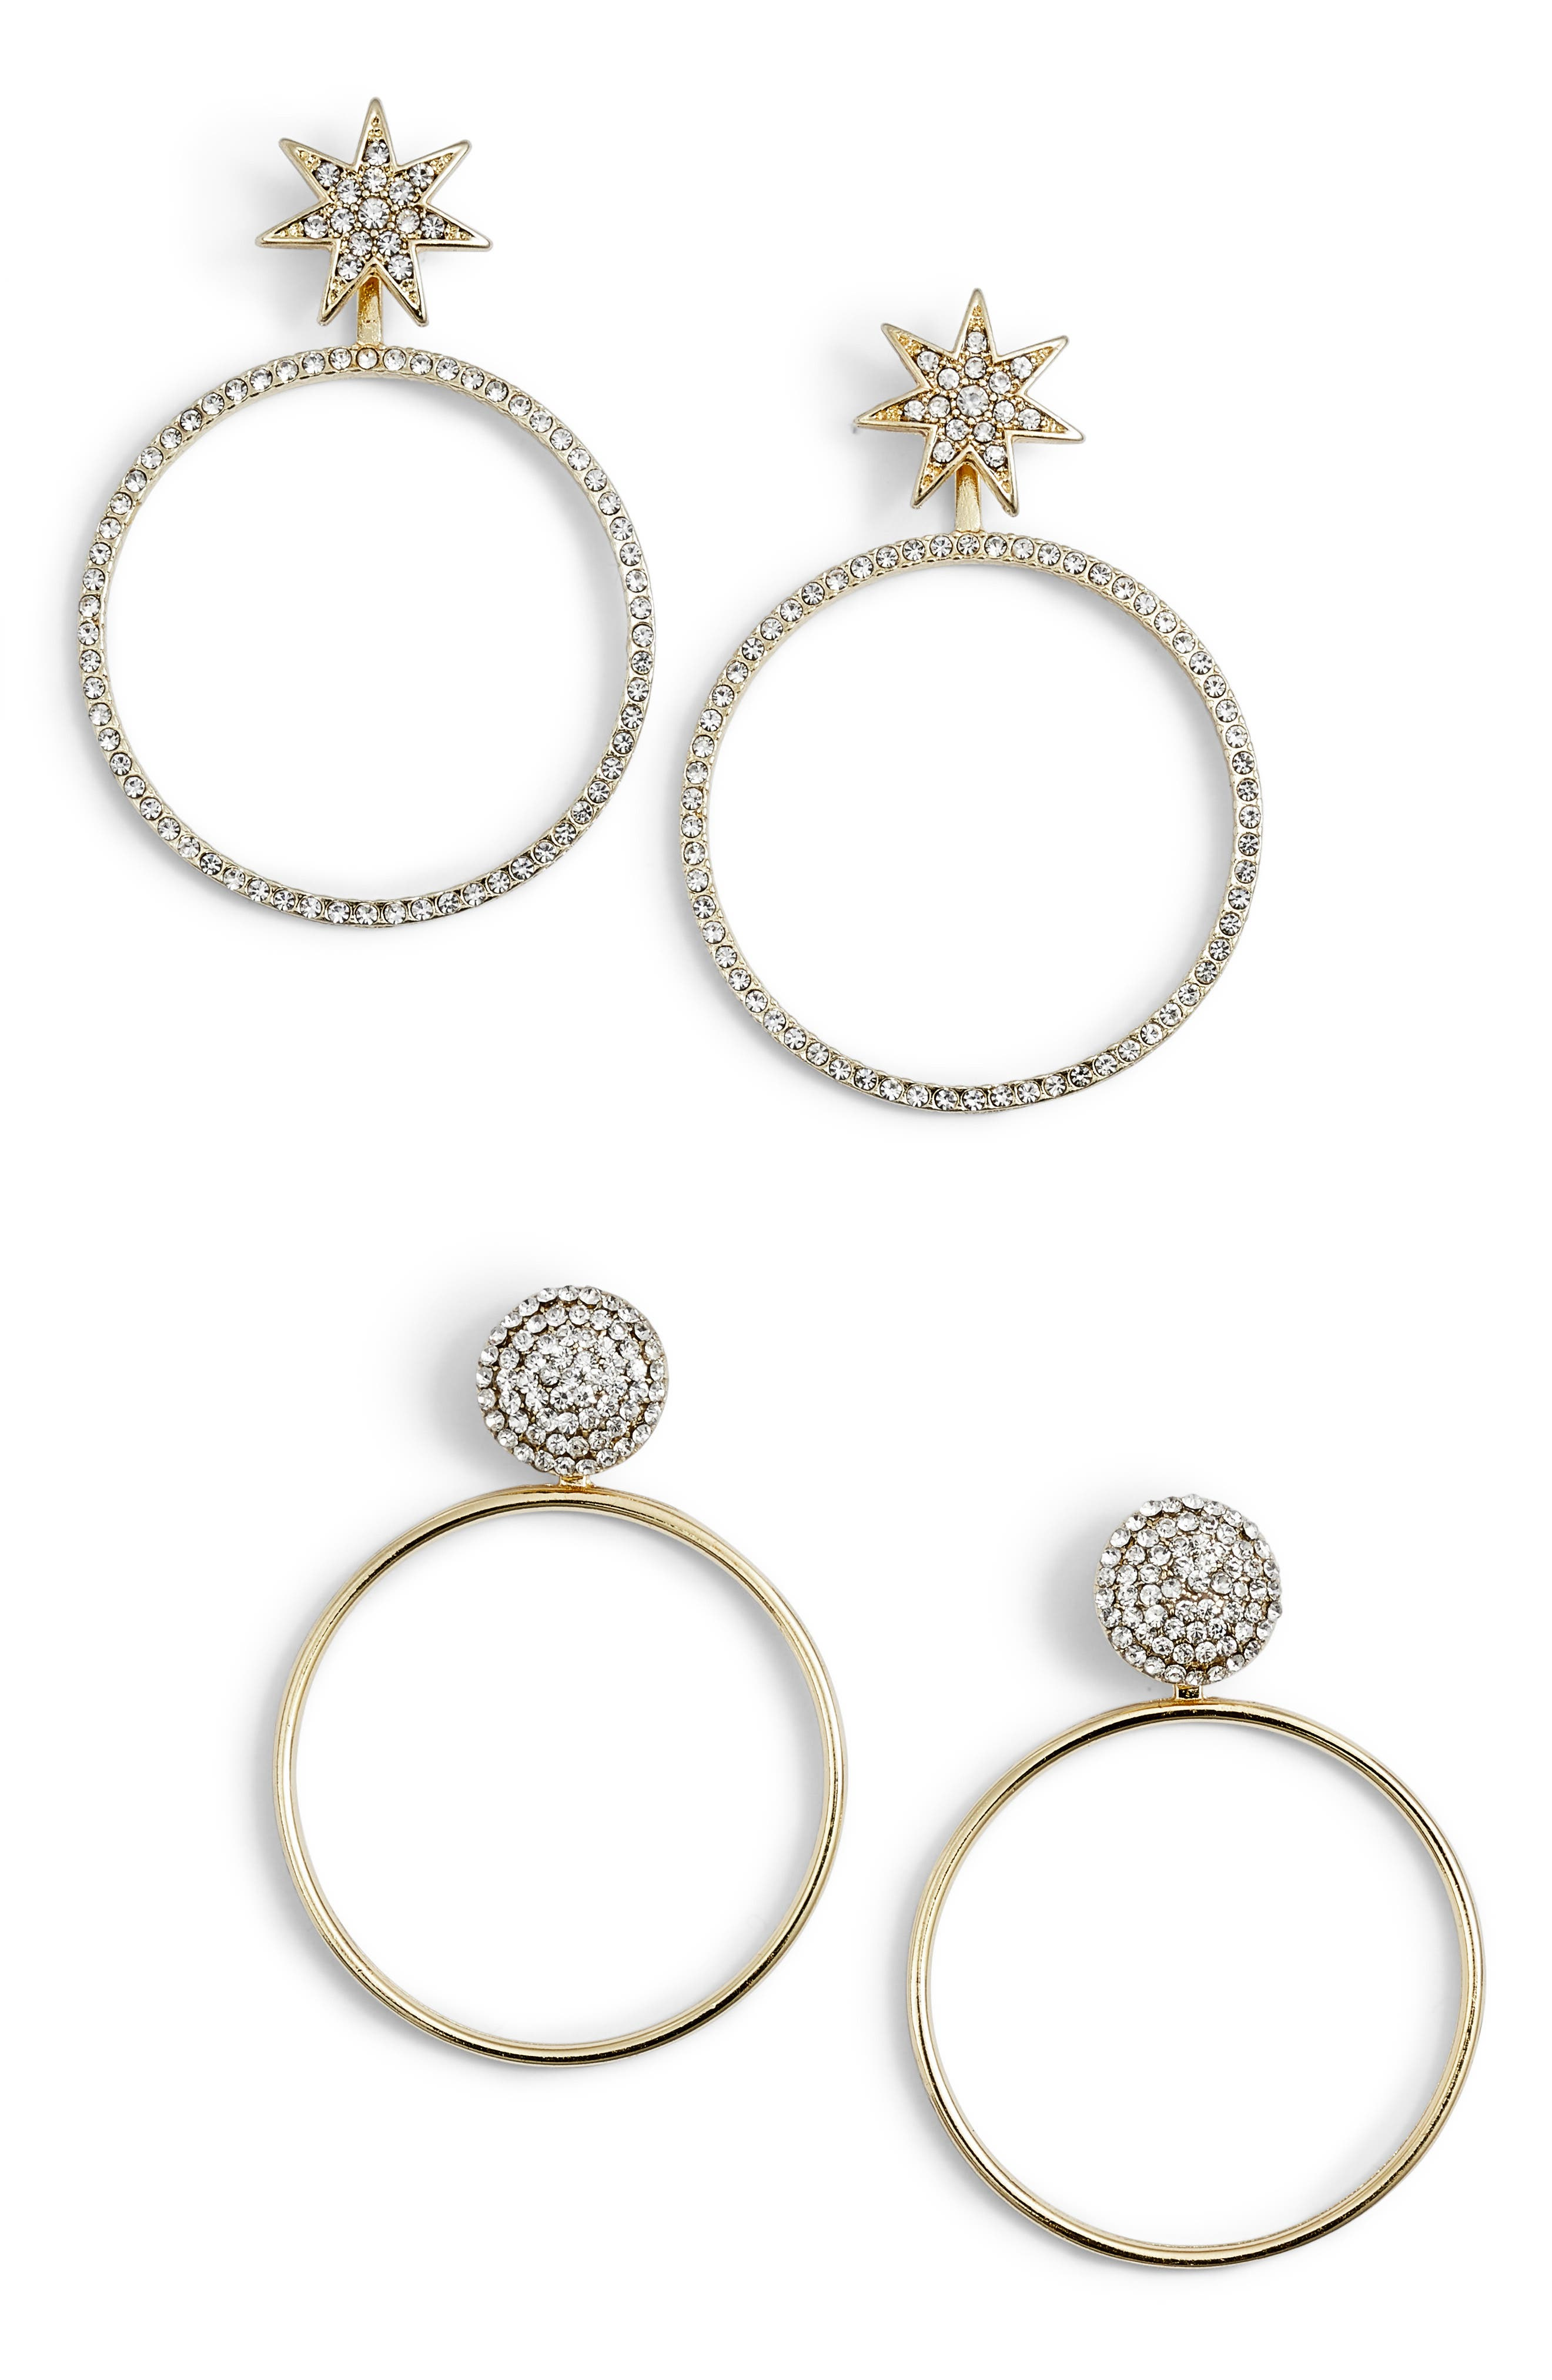 Twilight Set of 2 Hoop Earrings,                         Main,                         color, GOLD